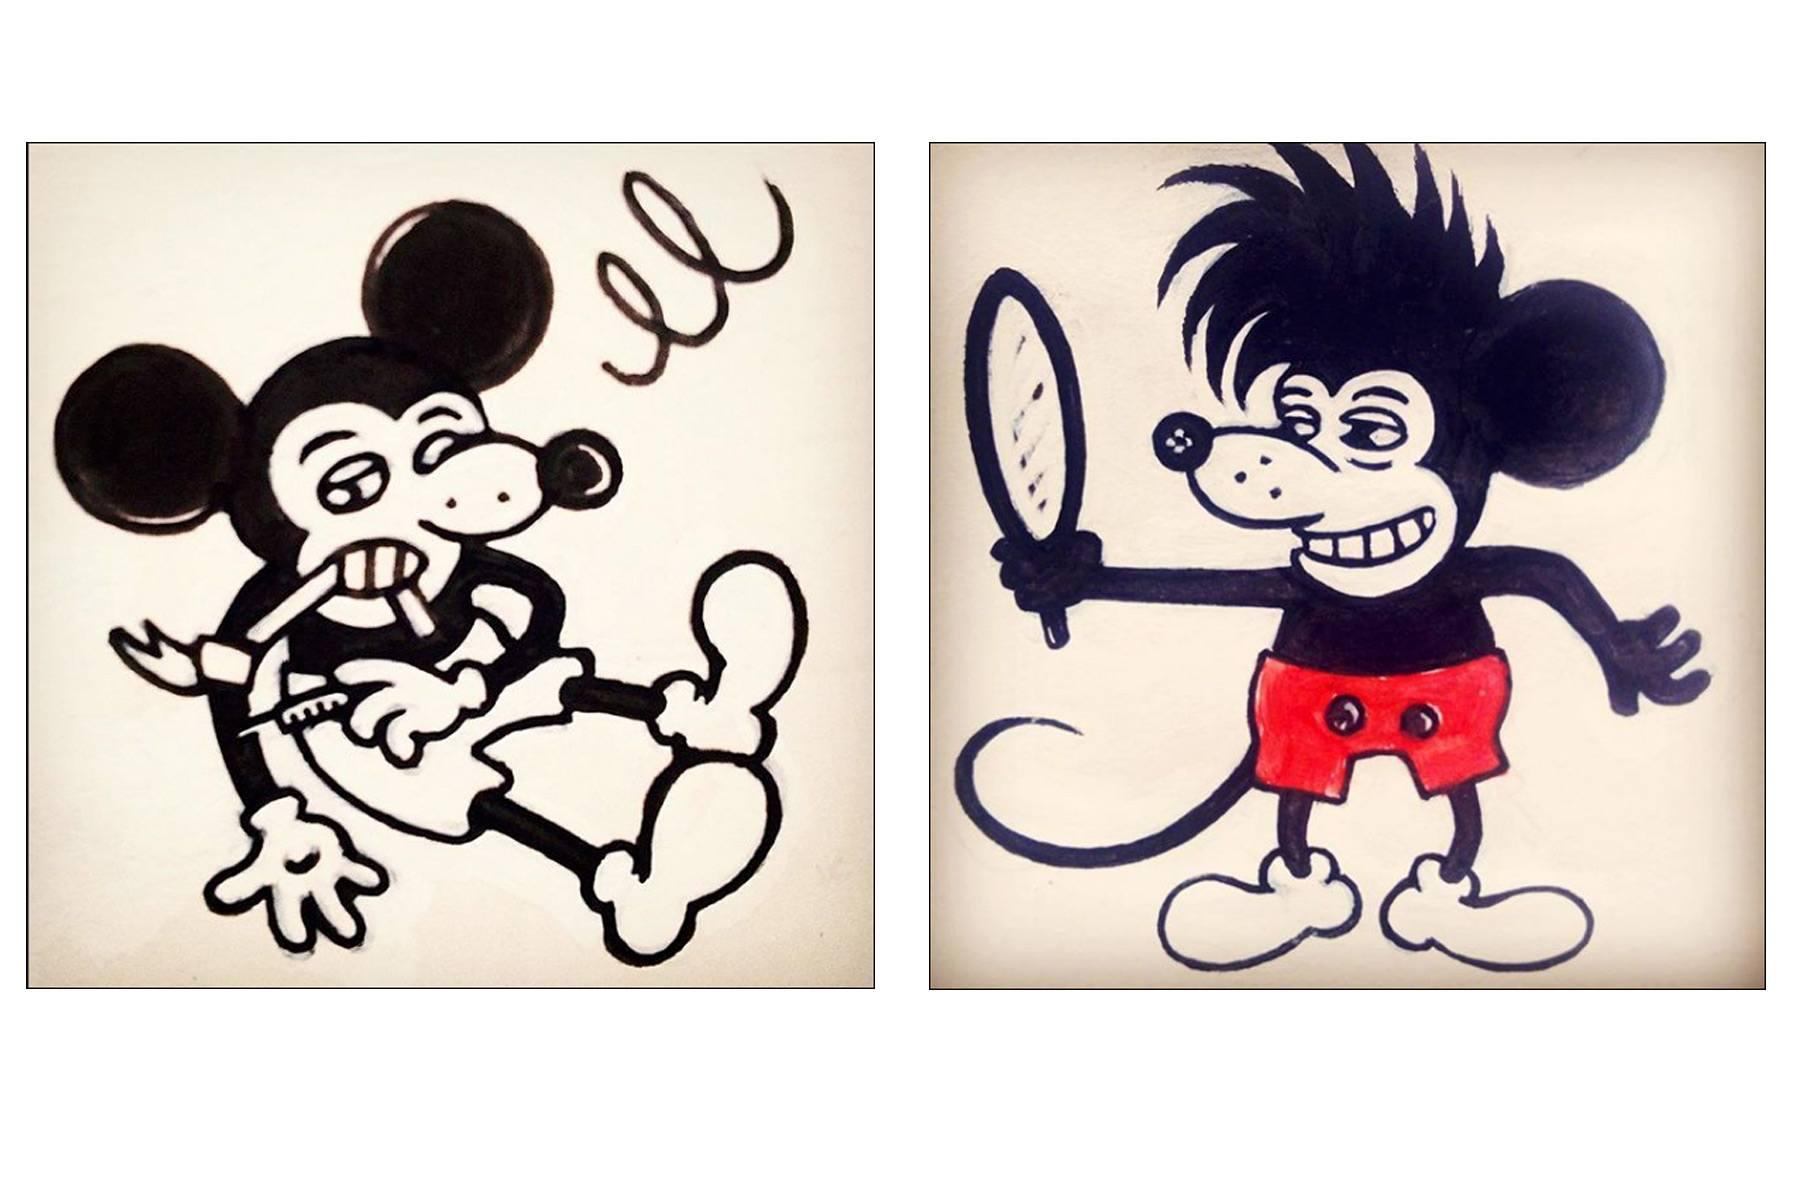 Mickey Mouse drawings by artist Avi Spivak. Ponyboy magazine.